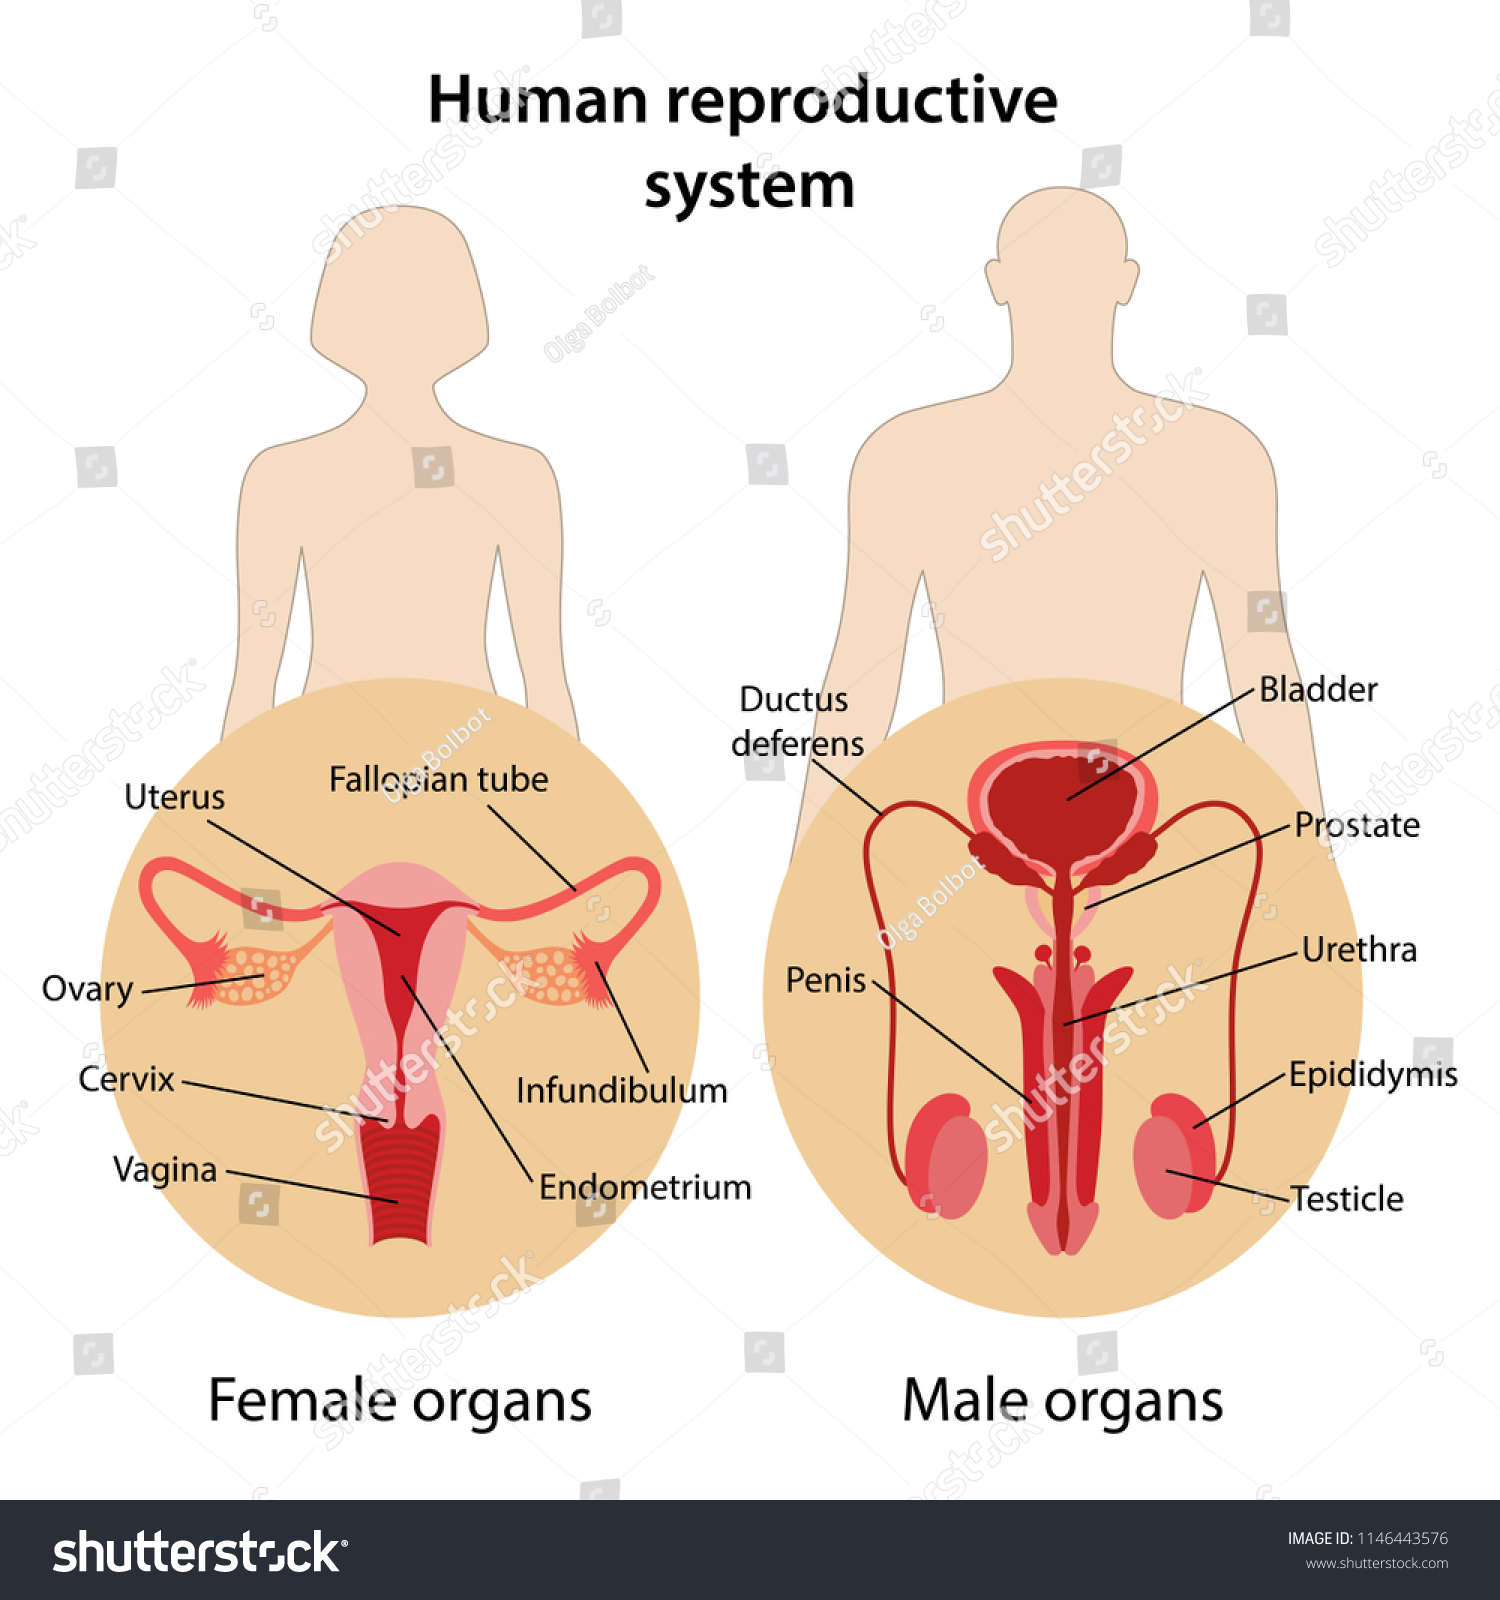 Human Reproductive System Main Parts Labeled Stock Vektorgrafik